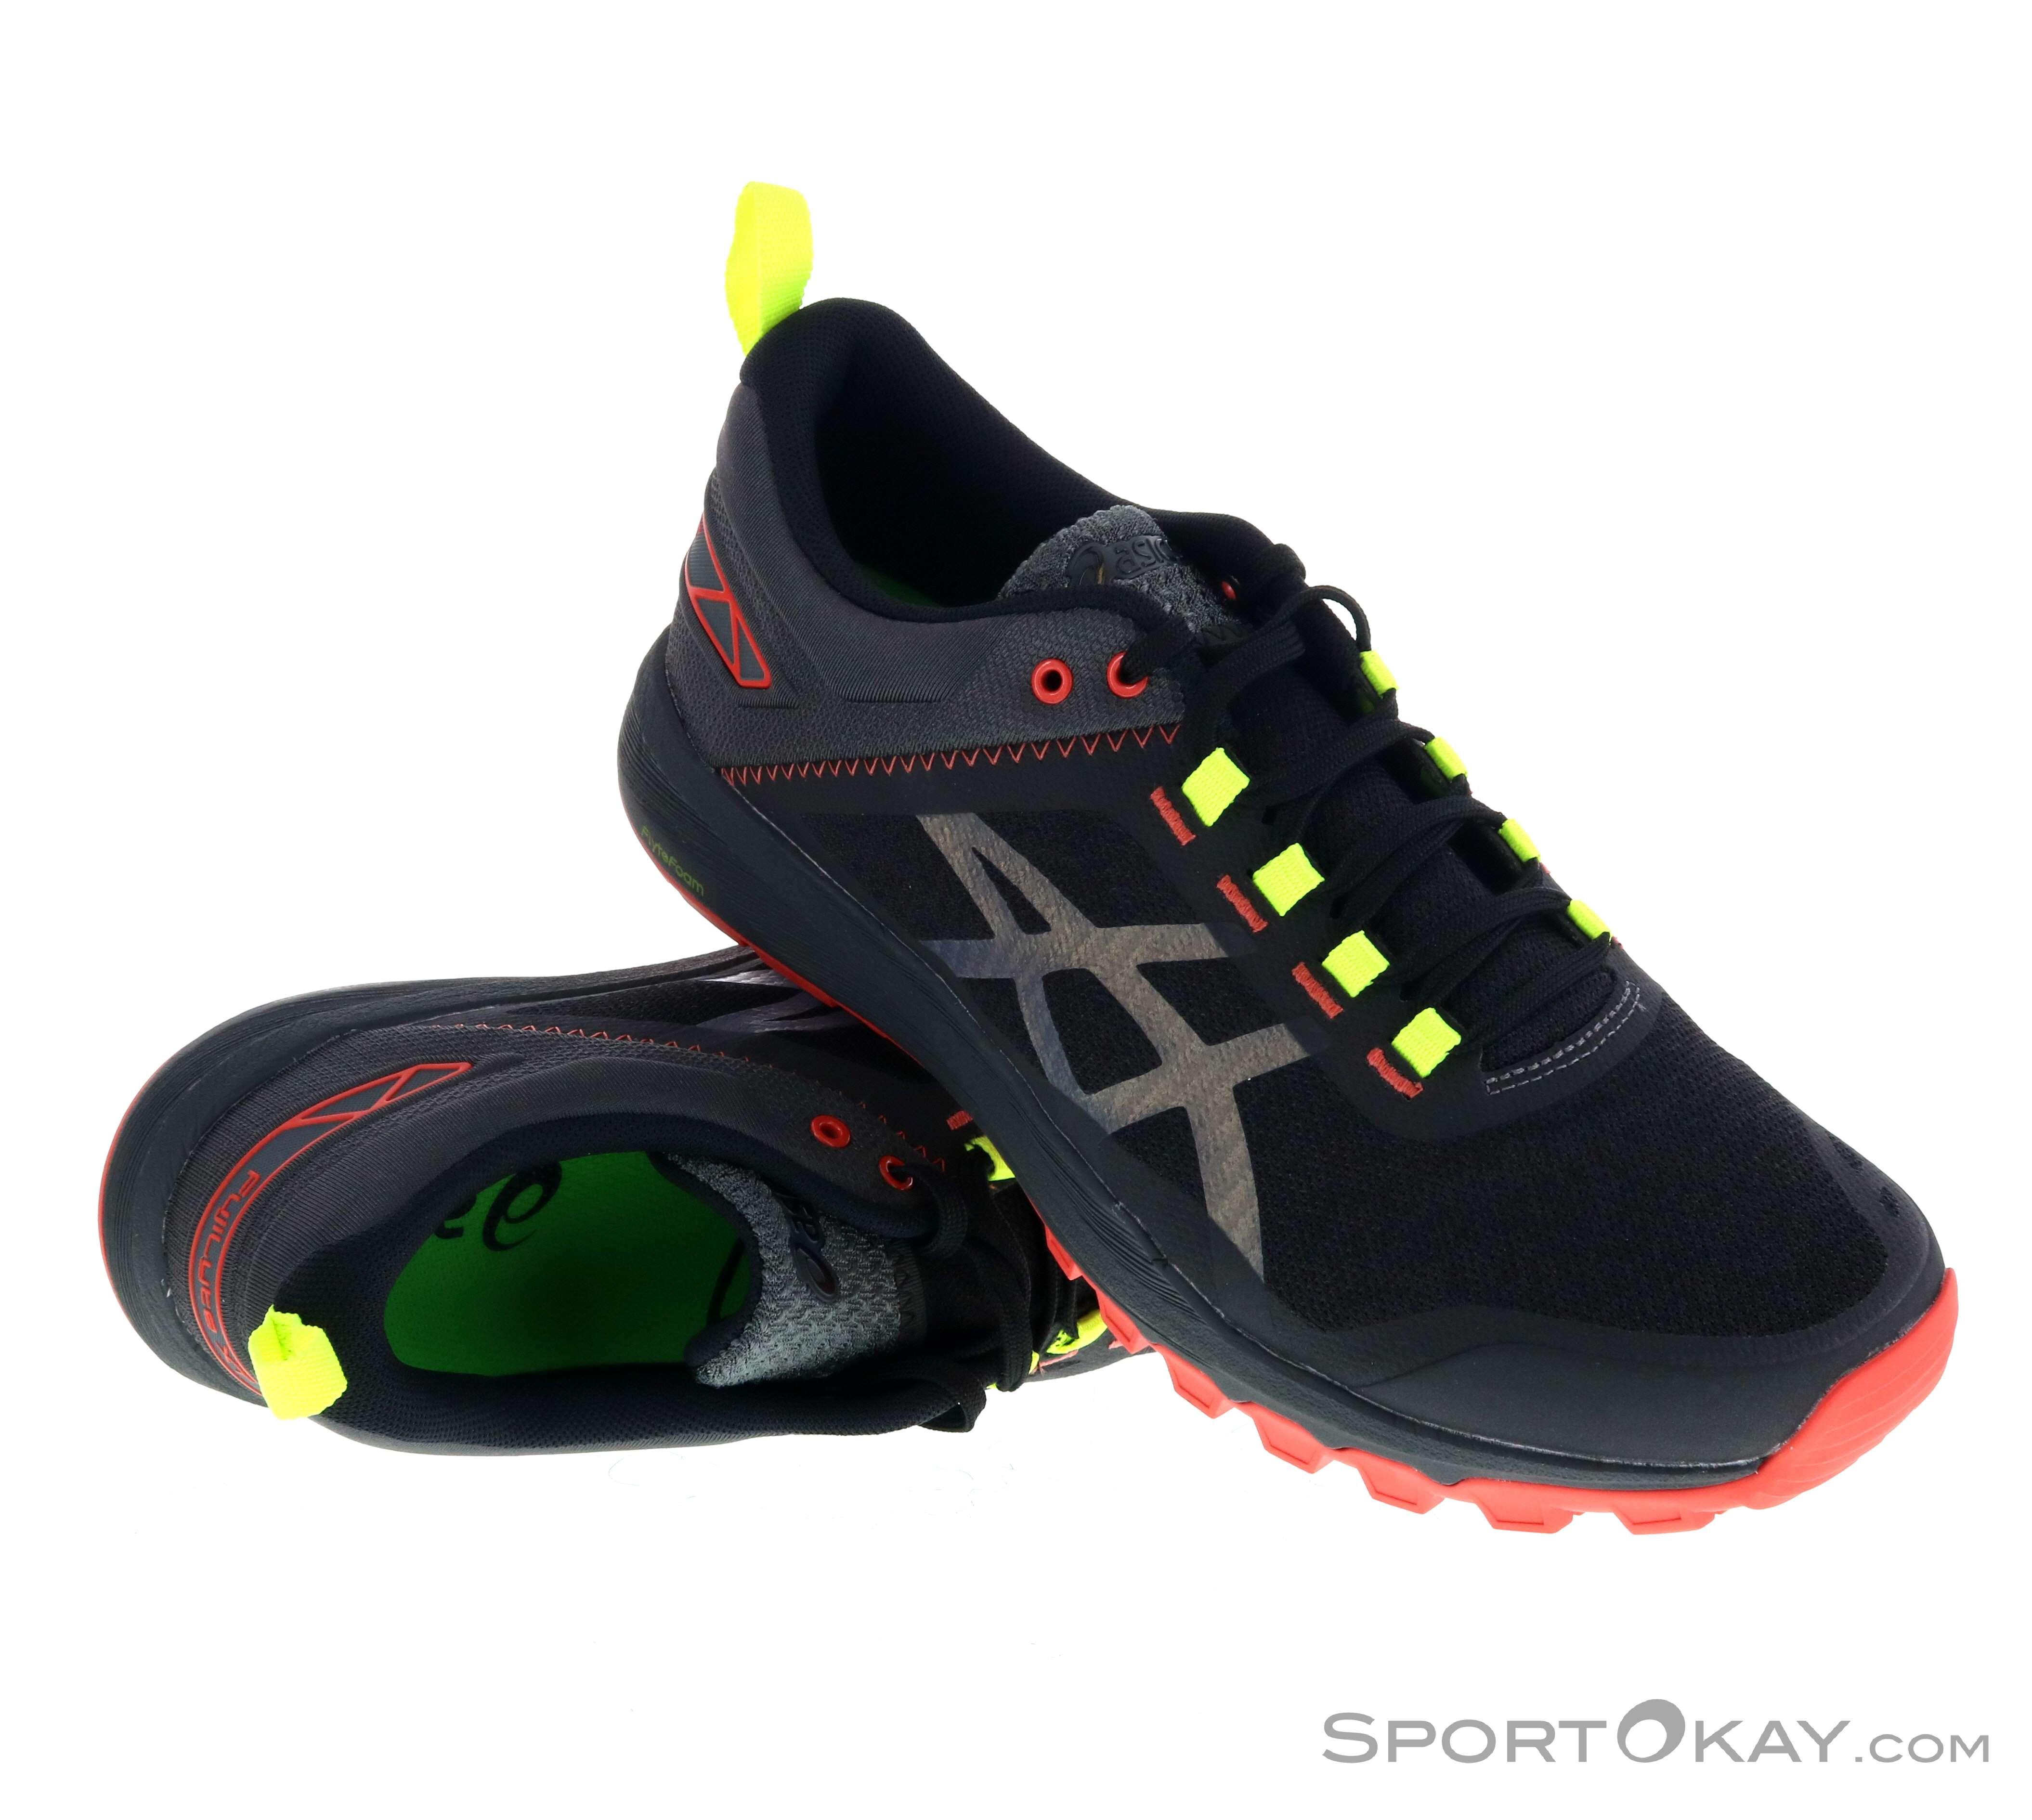 Xt Fujilyte Running Mens Asics Shoes oeQdBWxrC